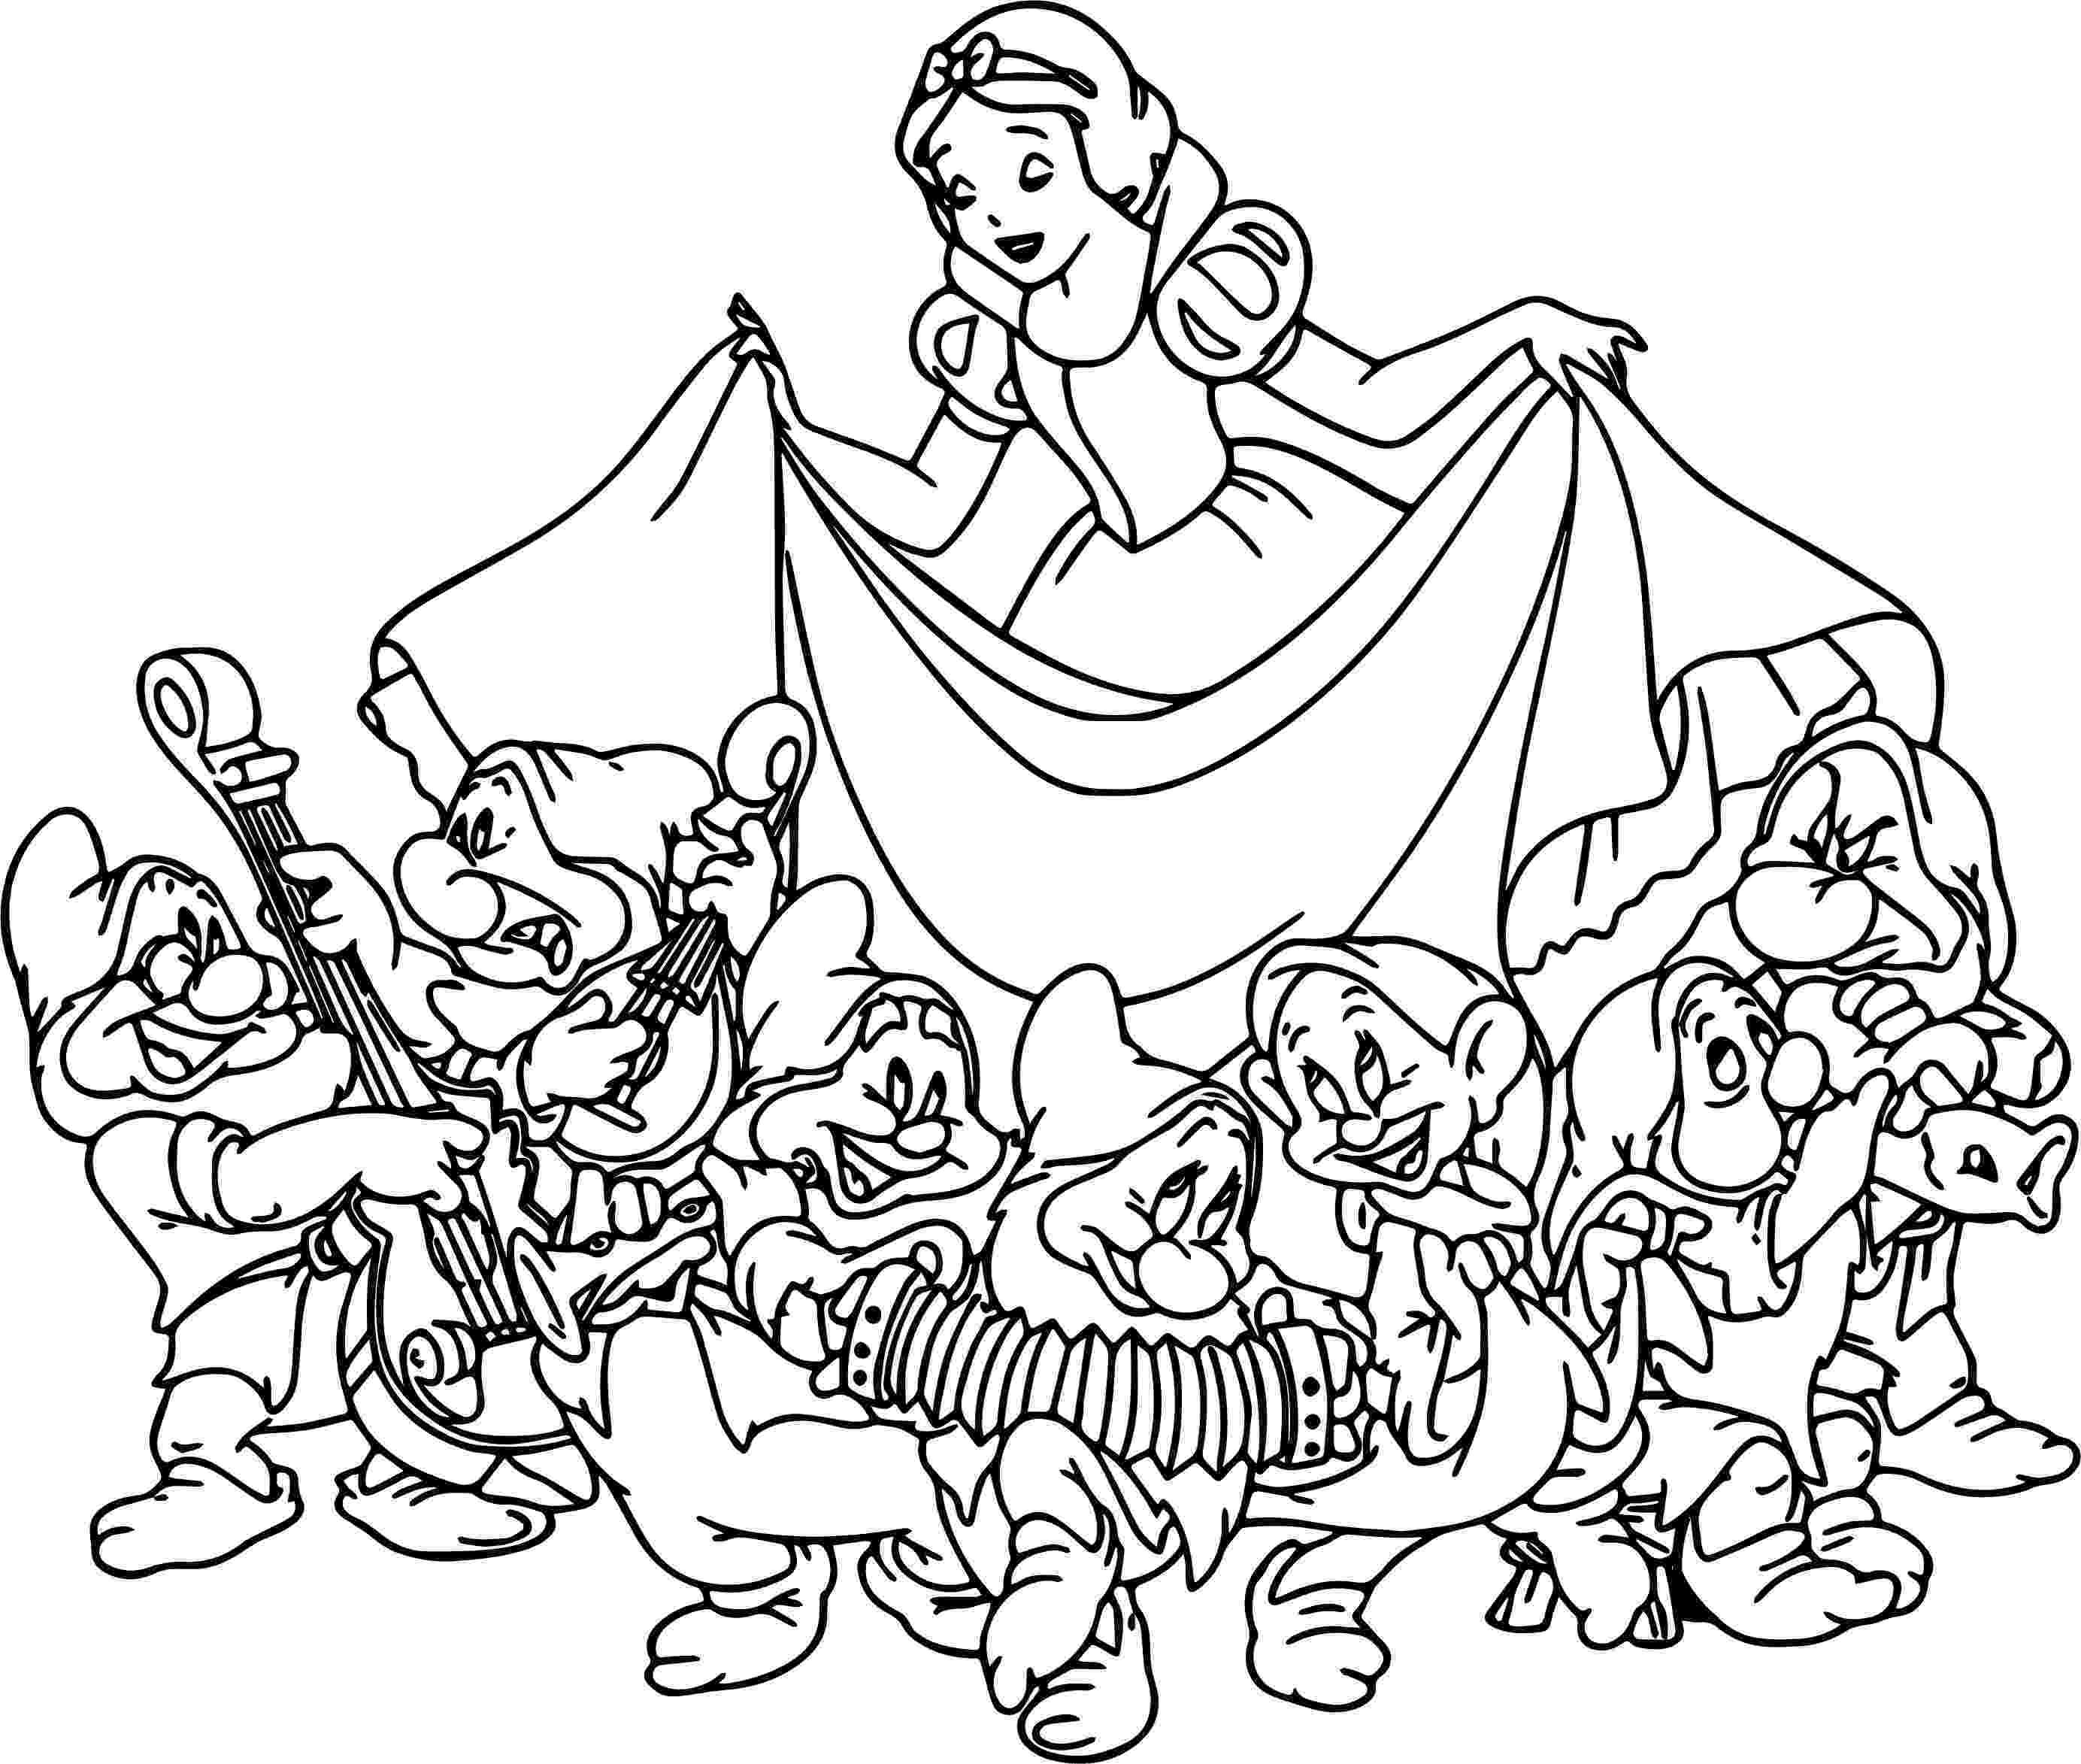 snow white and seven dwarfs coloring pages 17 beste afbeeldingen over tekeningen op pinterest dwarfs coloring seven white pages and snow